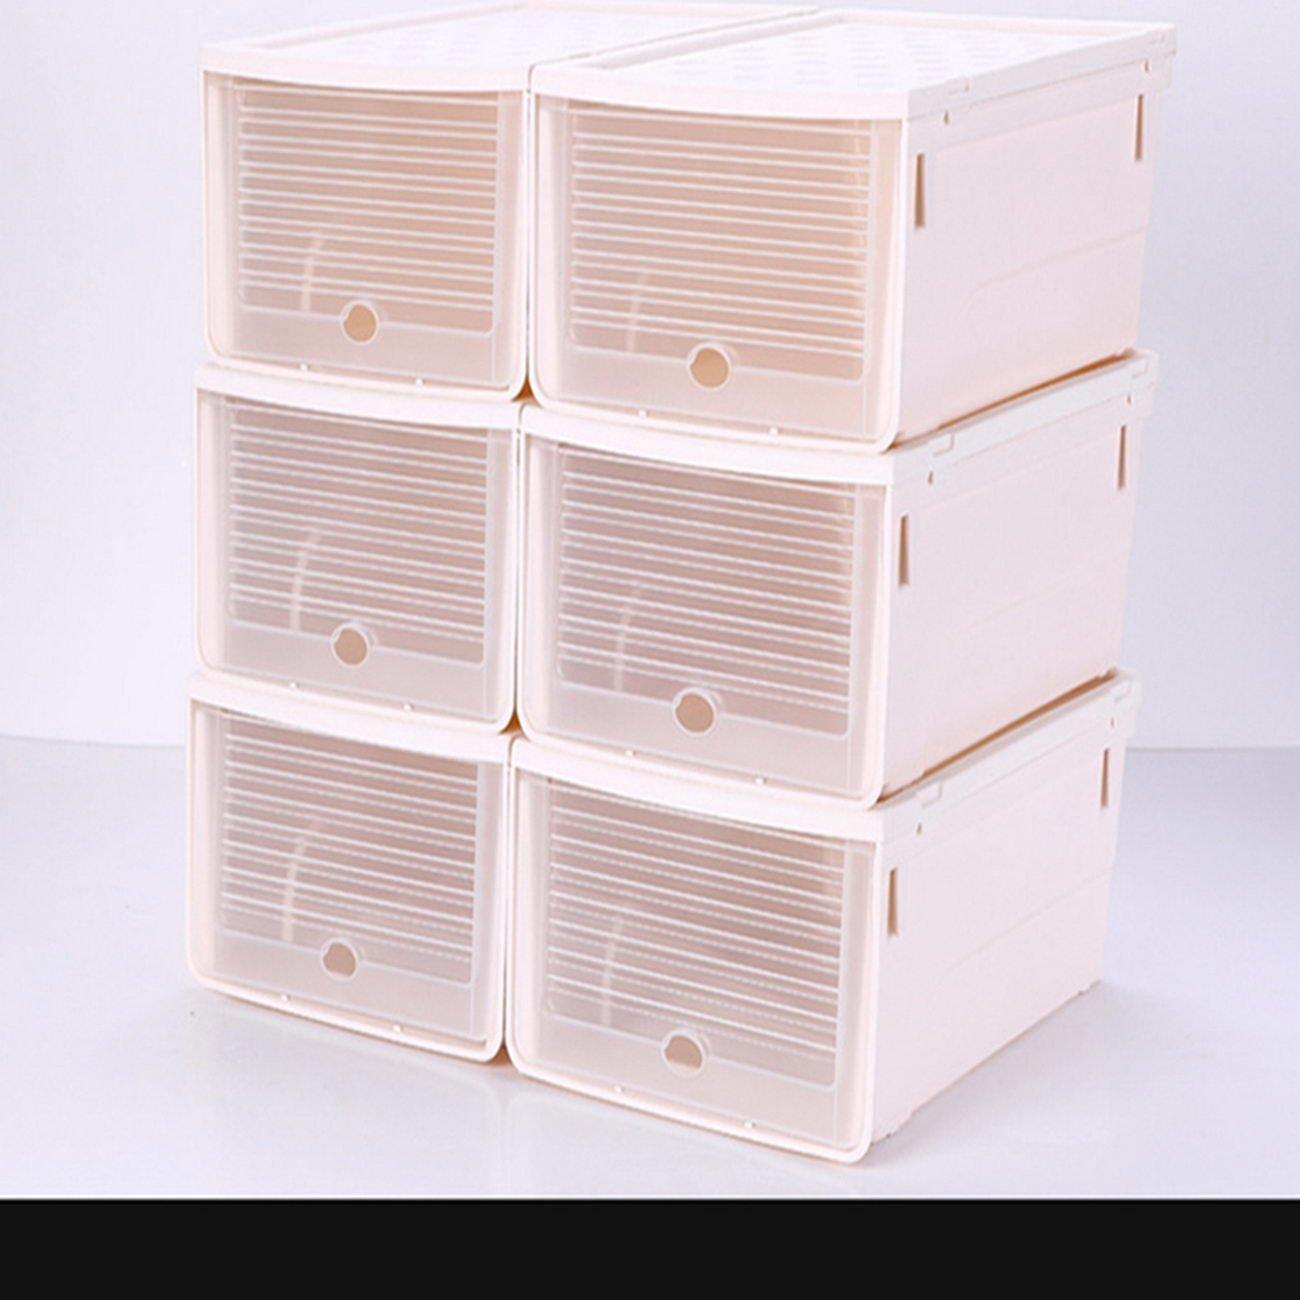 jii2030shann finishing box shoe boxes shoebox thick clamshell storage box plastic plastic shoes storage box shoe box, finishing box shoe box